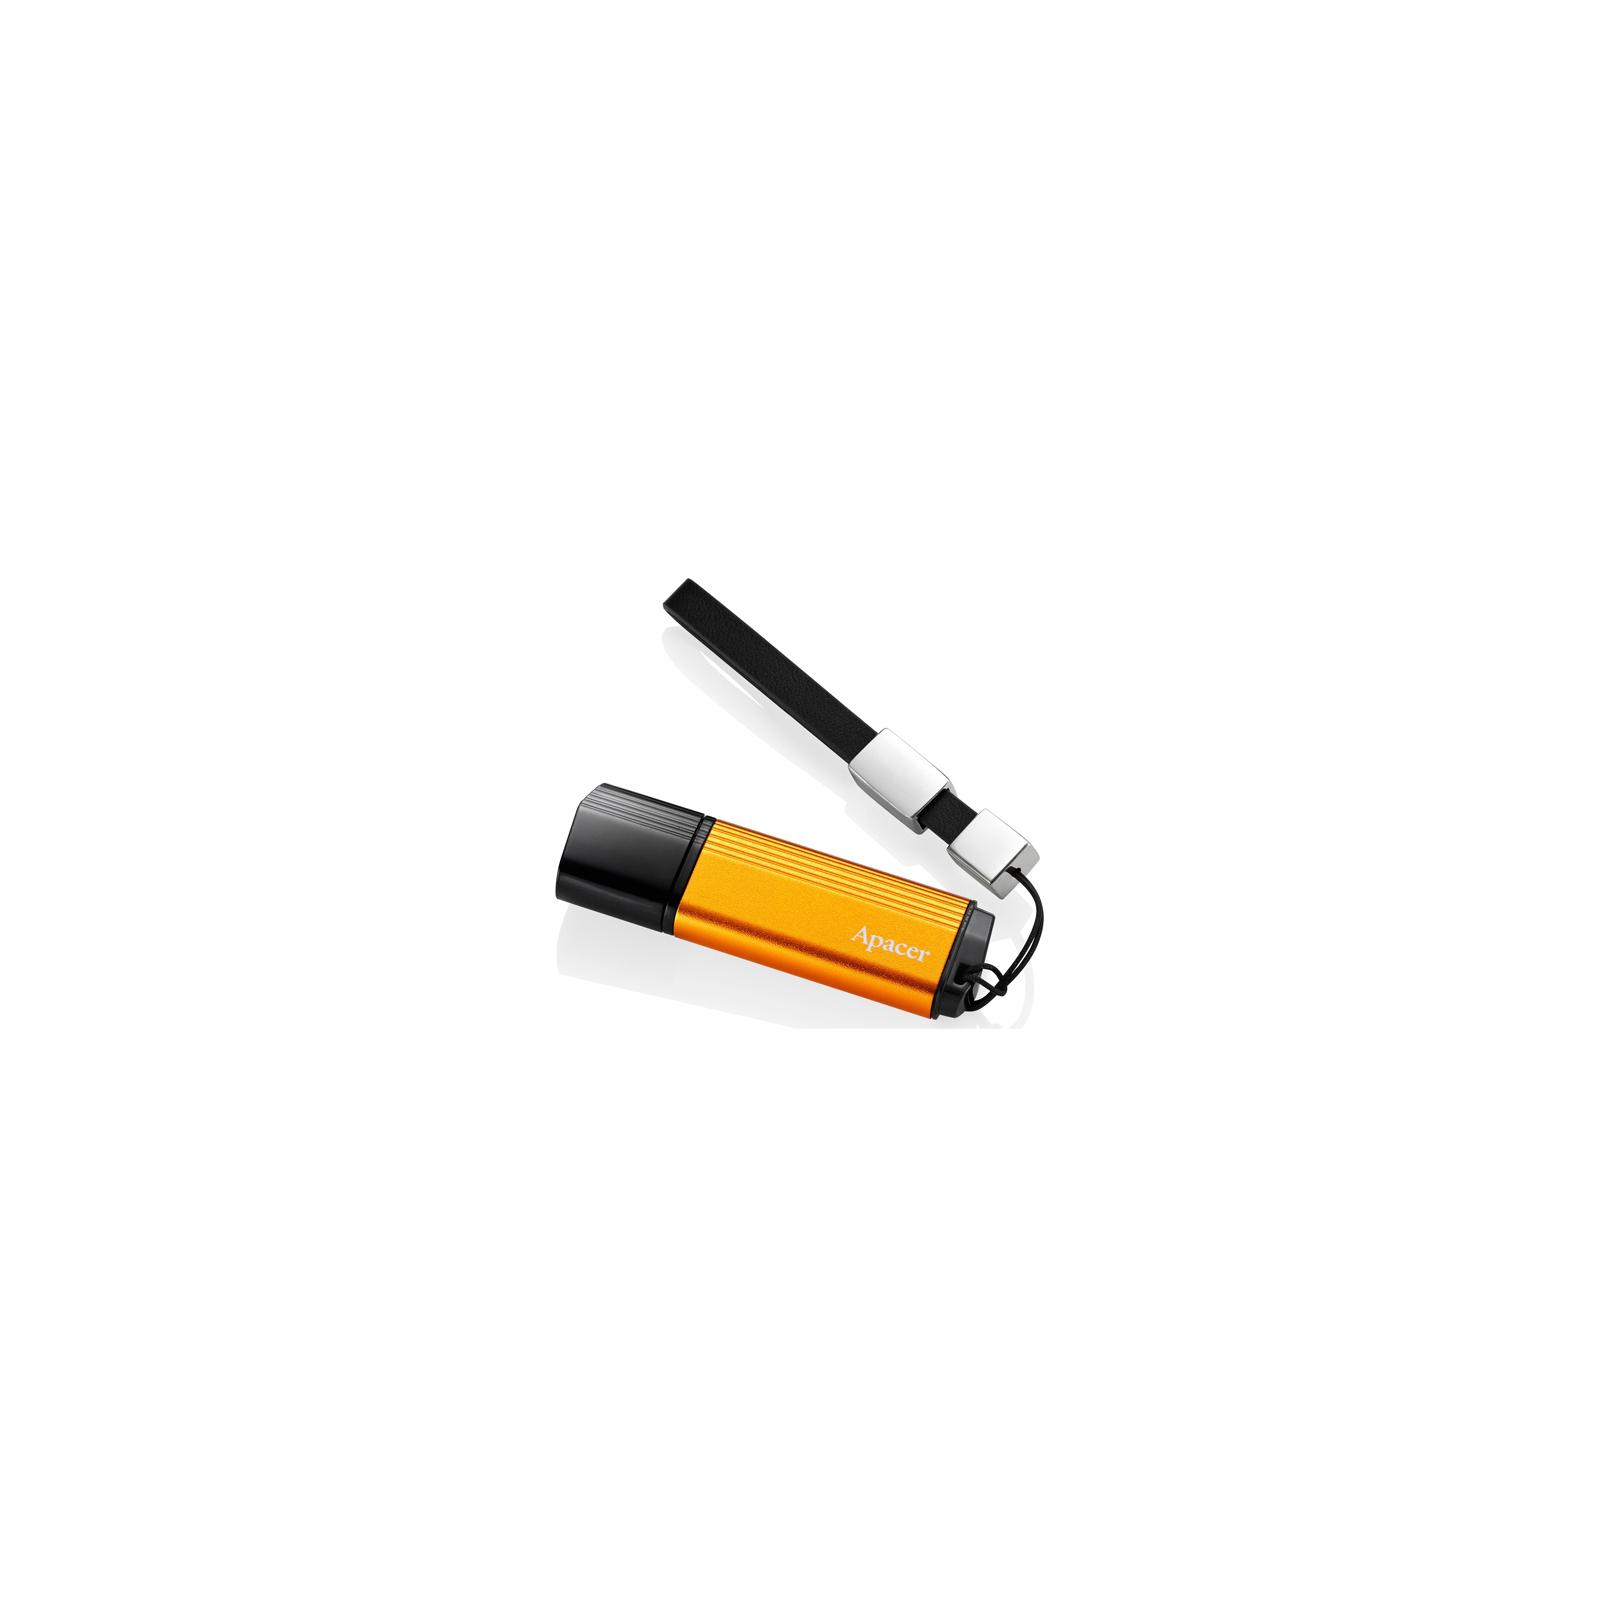 USB флеш накопитель 8GB AH330 Fiery orange RP USB2.0 Apacer (AP8GAH330T-1) изображение 3